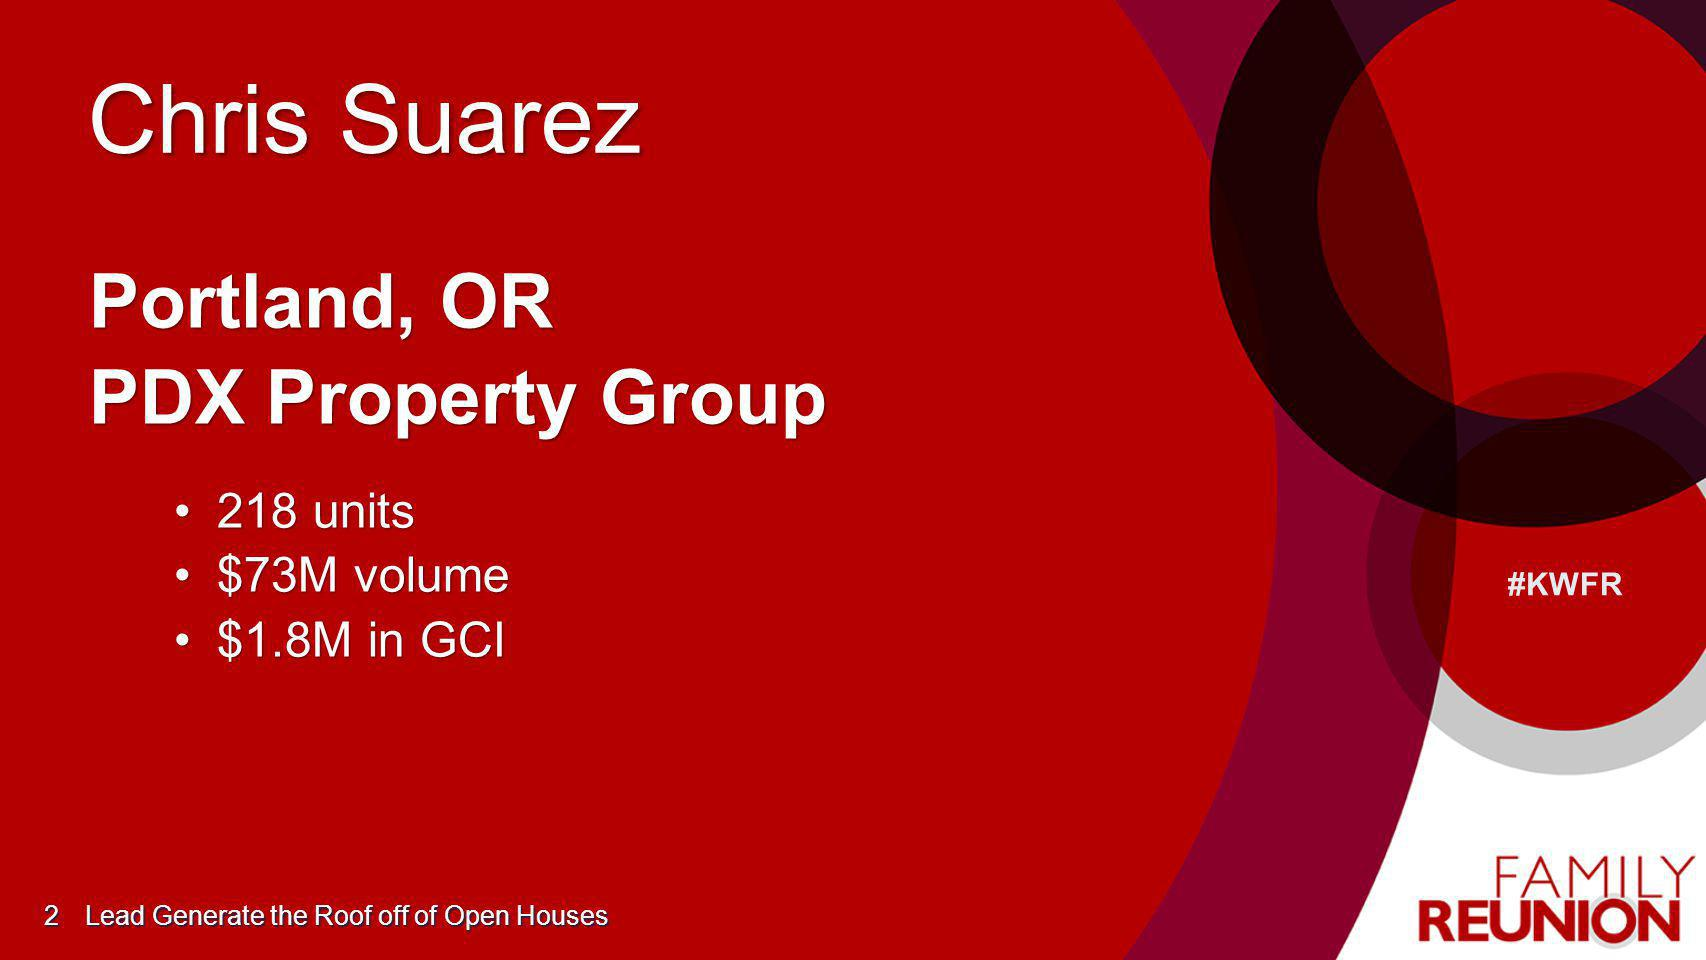 Chris Suarez Portland, OR PDX Property Group 218 units $73M volume